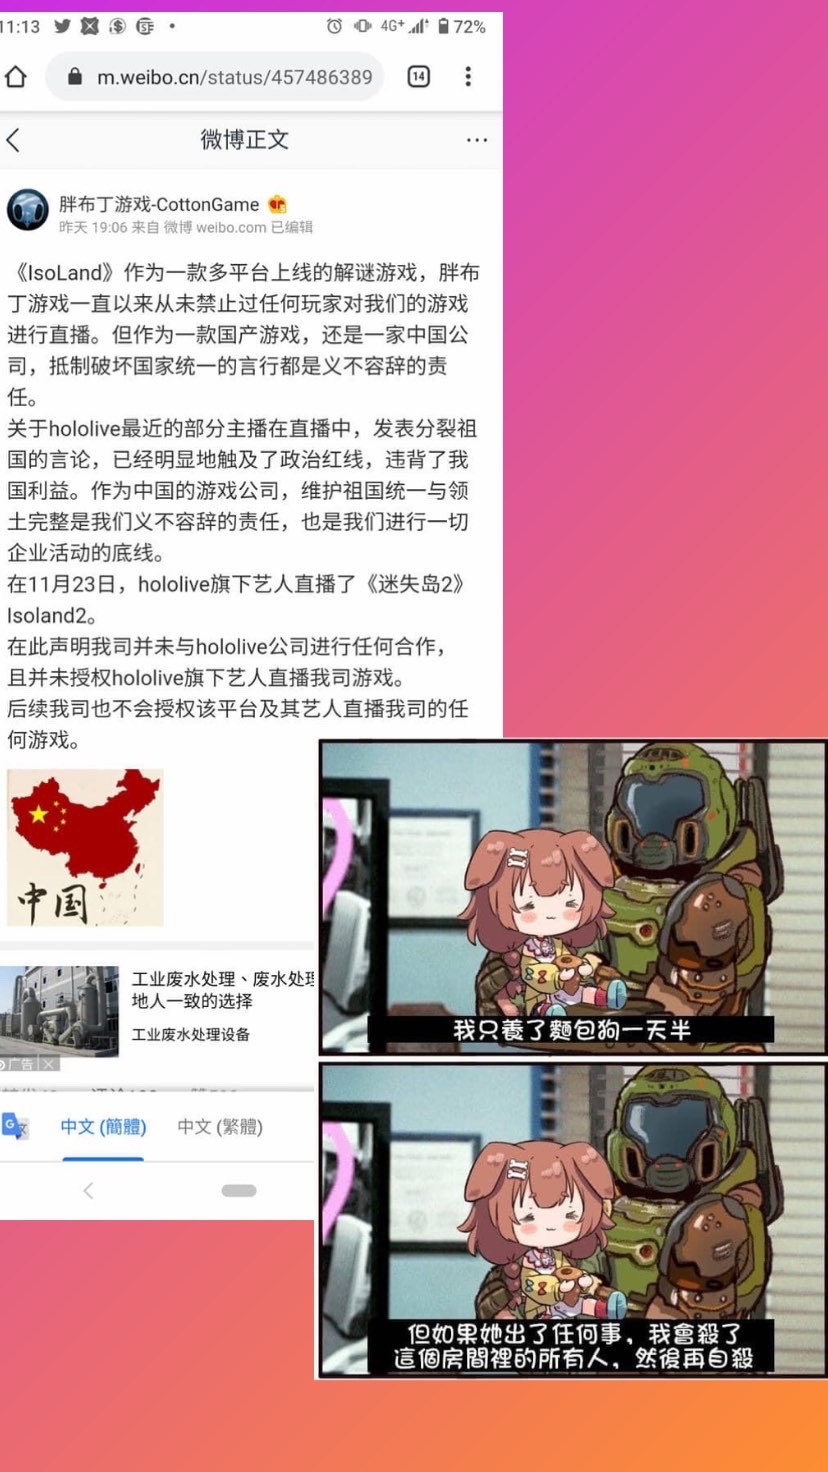 https://upload.hkgolden.media/comment/vxxchsyo.lacprjfgl1x.4pc04jcyp2l.khu.jpg